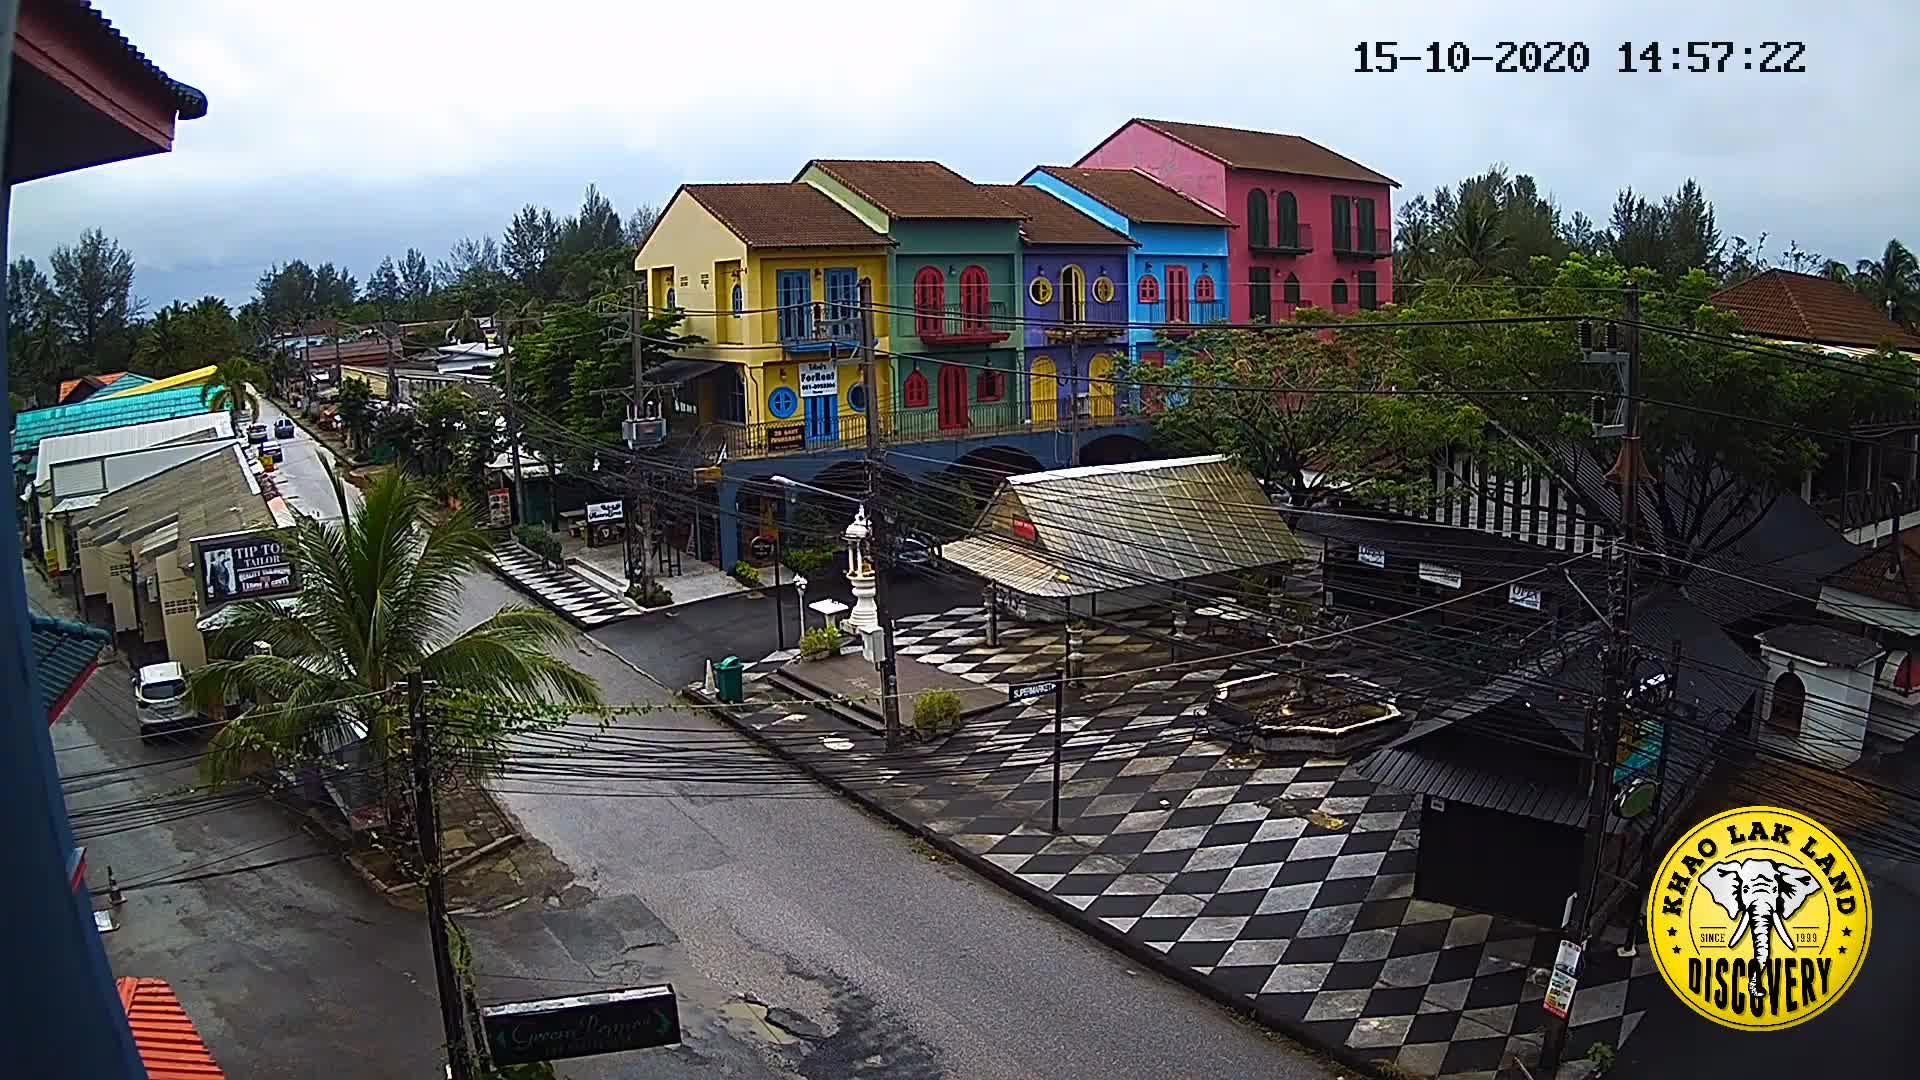 Gustavia Wed. 03:59